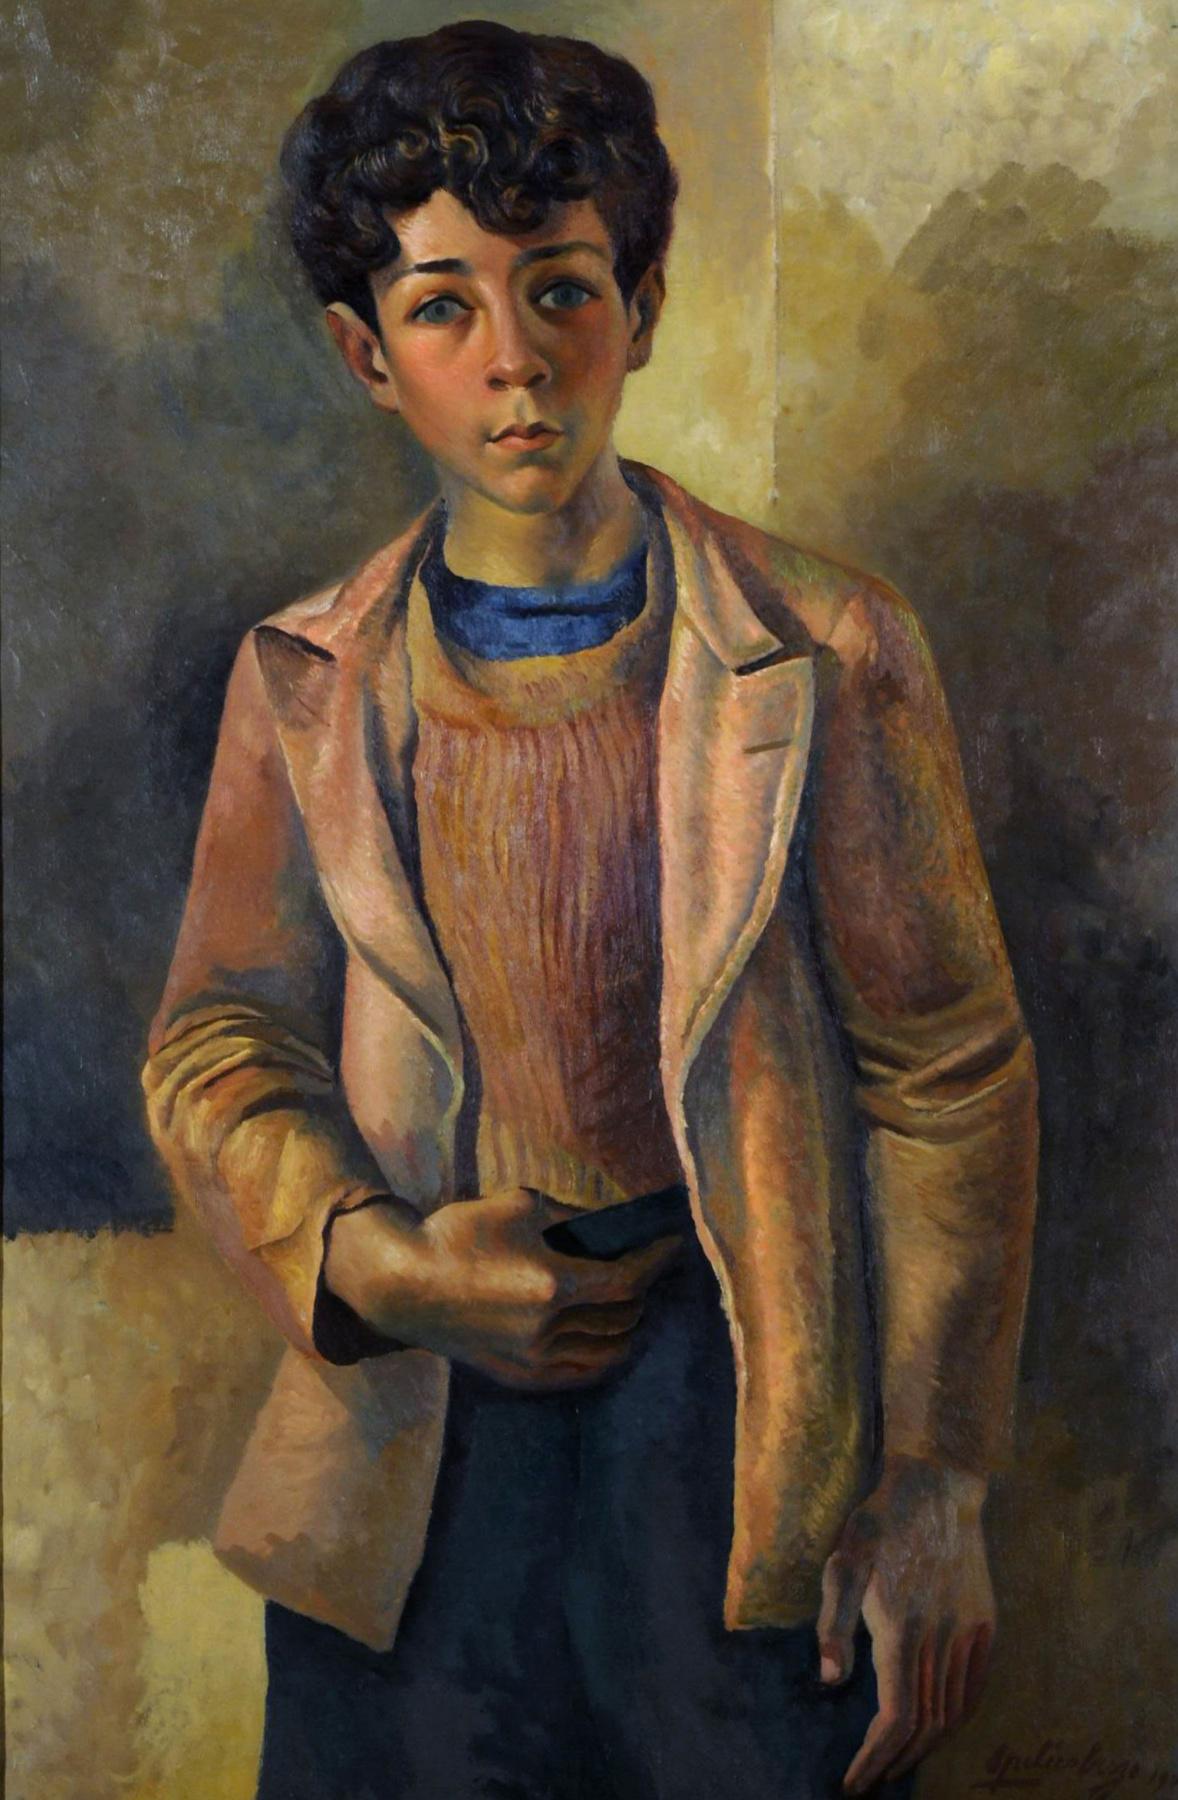 (no name). Boy Figure or Portrait